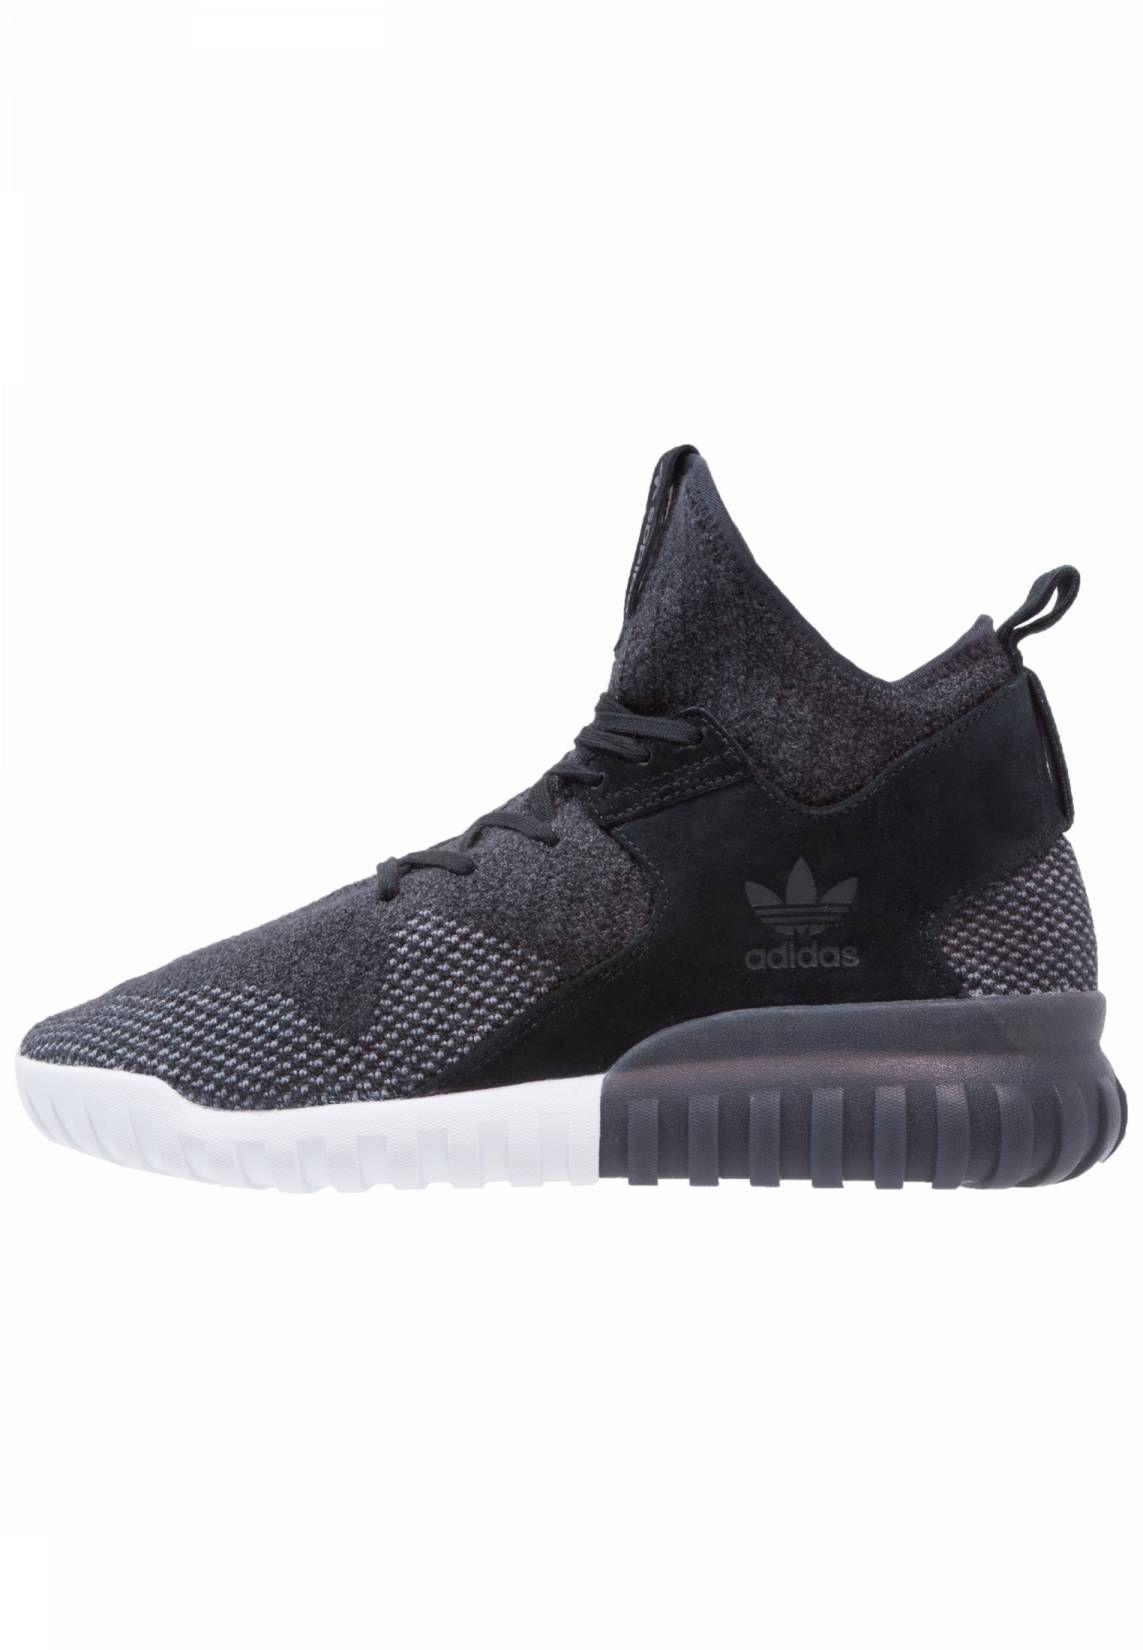 29918465f1db41 adidas Originals. TUBULAR X - High-top trainers - core black dark grey